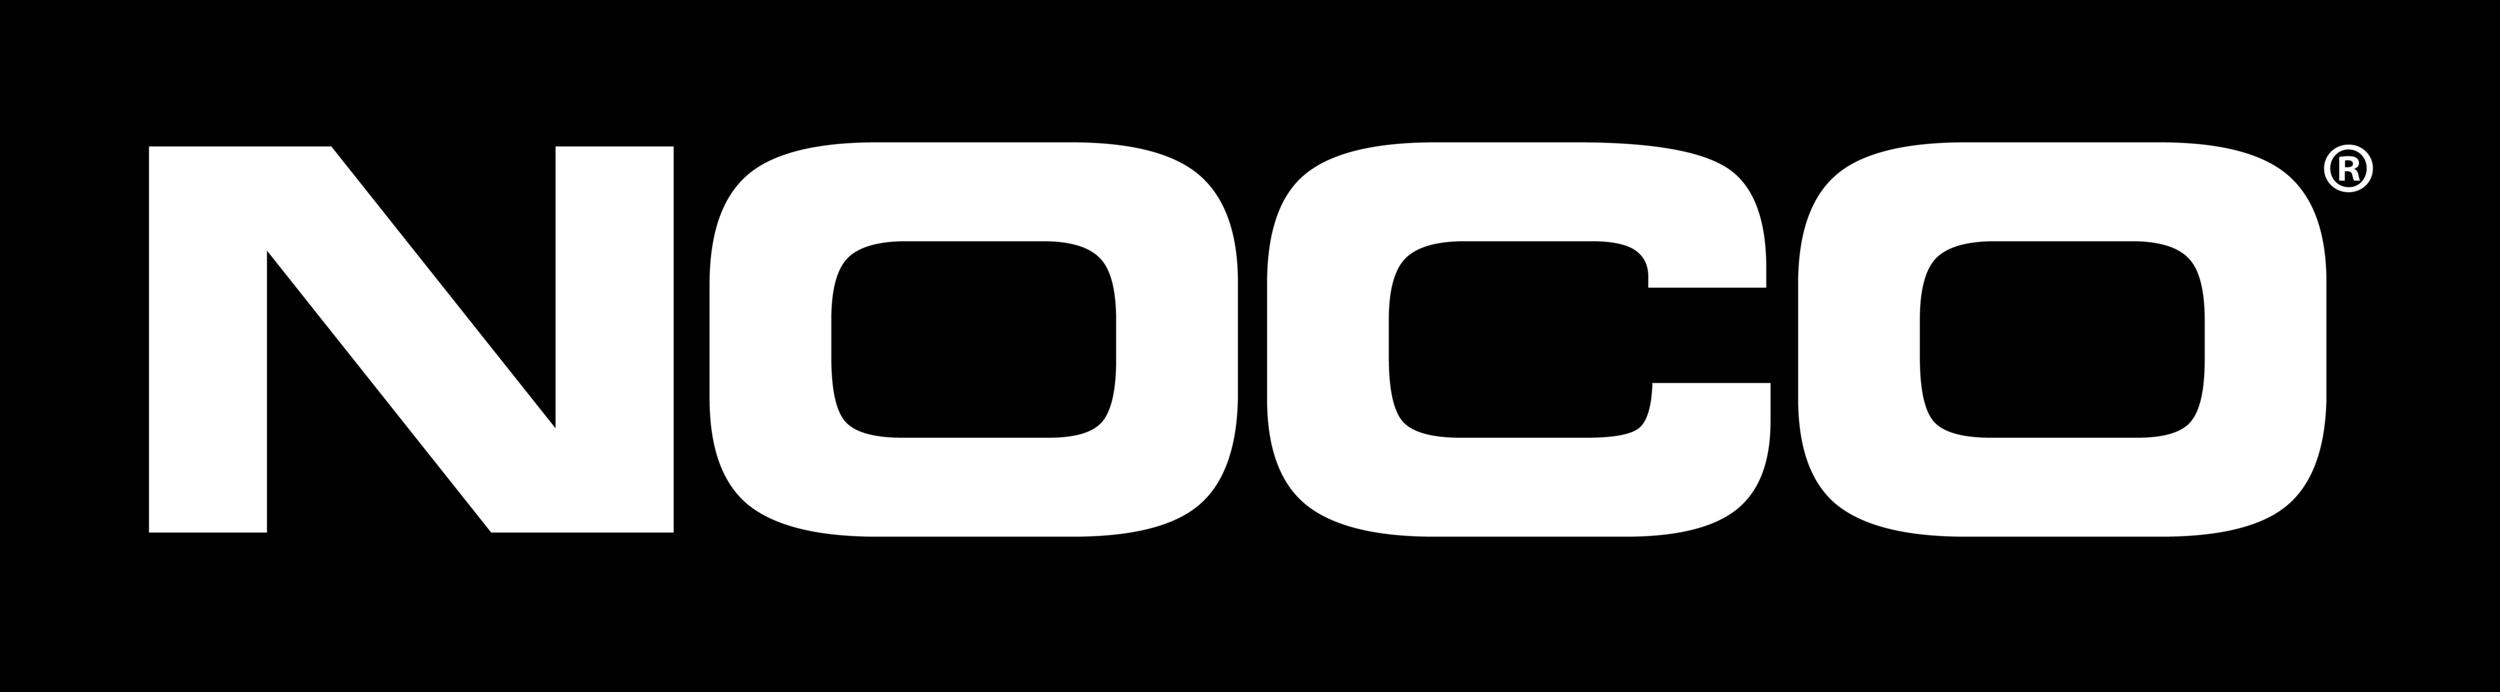 NOCO_Logo_3000x830.png